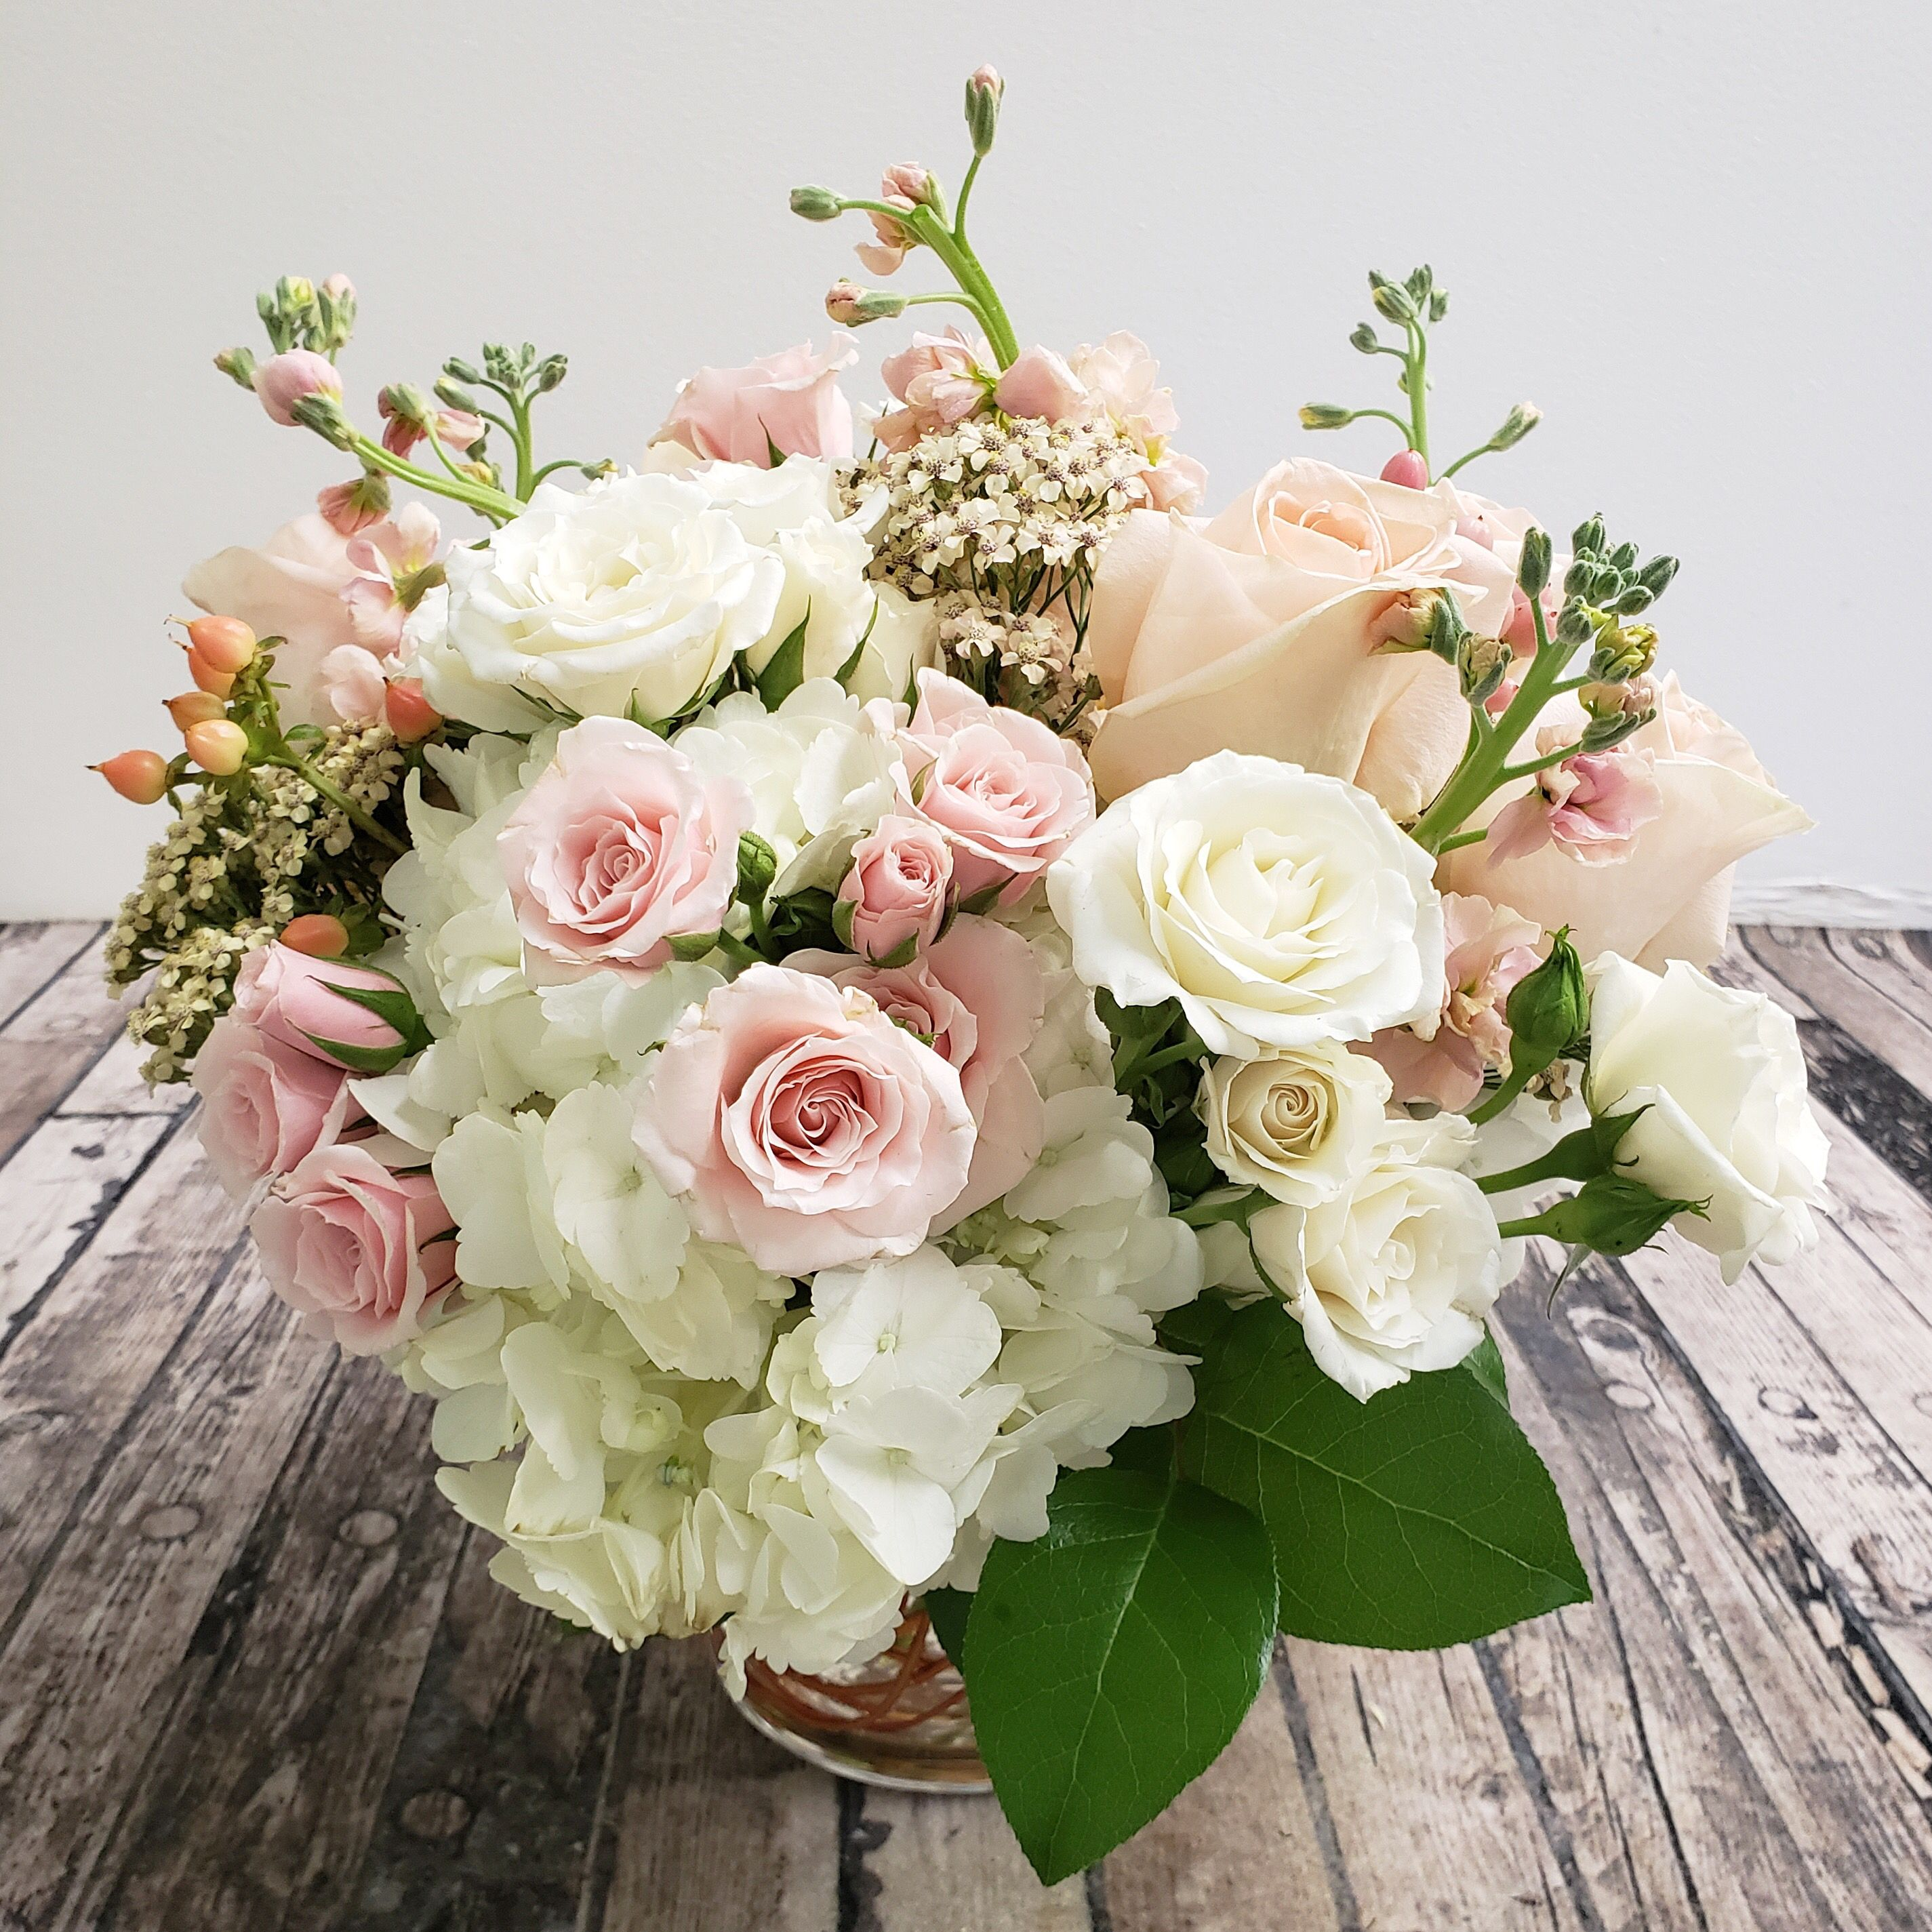 Wedding Flower Arrangement Flower Arrangements Flower Delivery Wedding Flower Arrangements